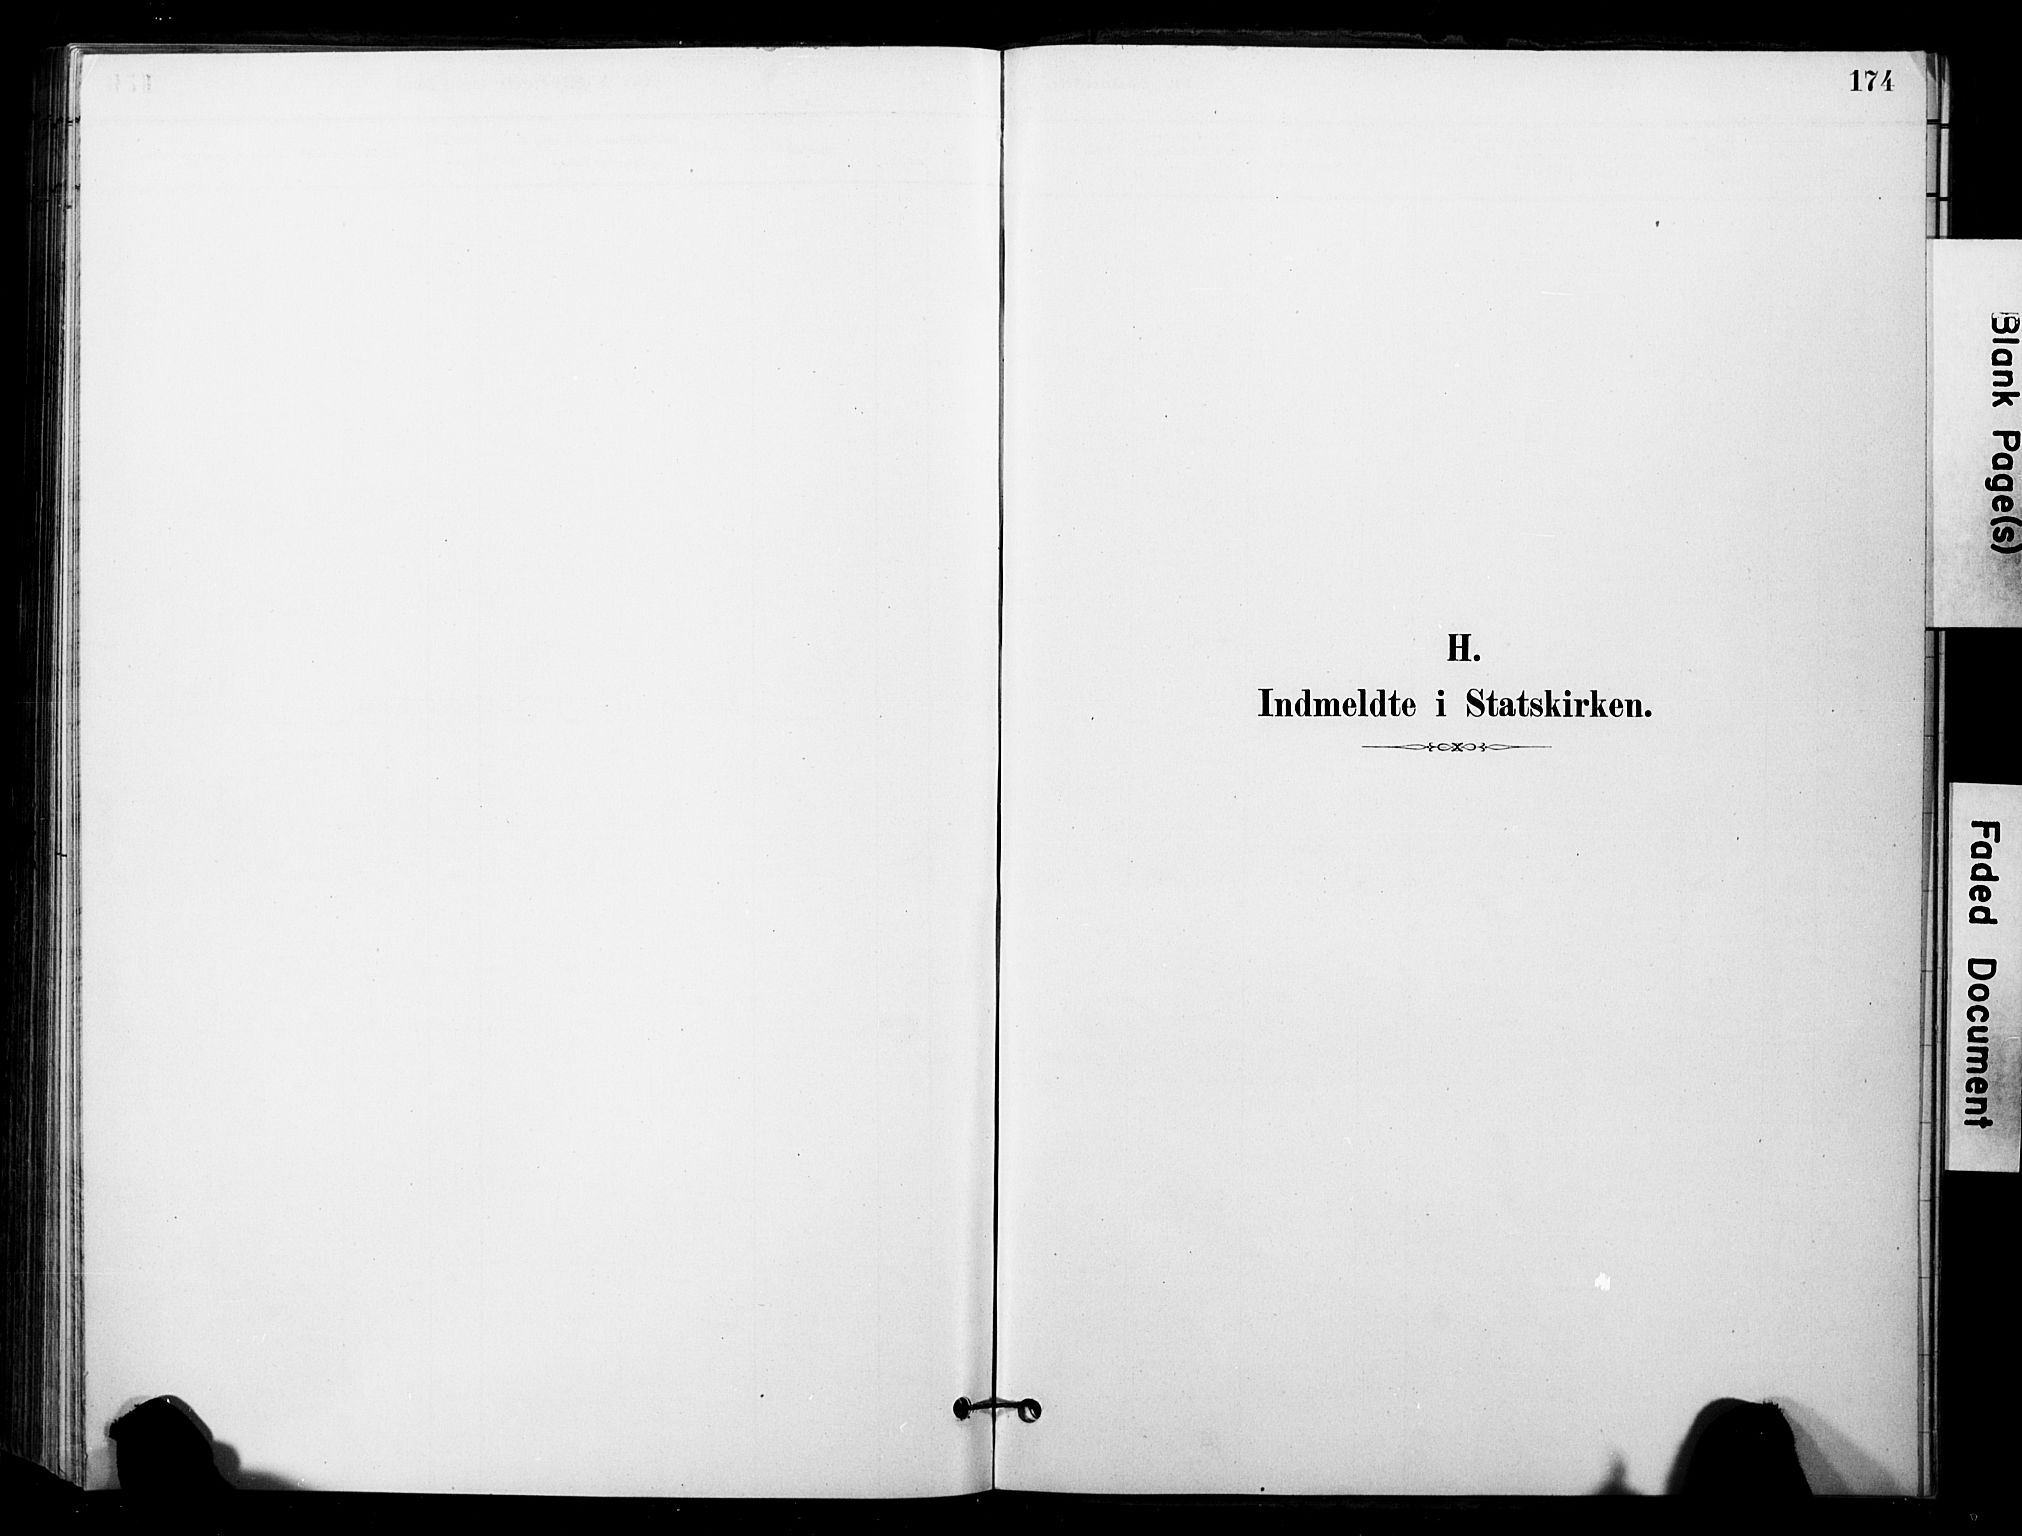 SATØ, Ibestad sokneprestembete, Ministerialbok nr. 14, 1880-1887, s. 174